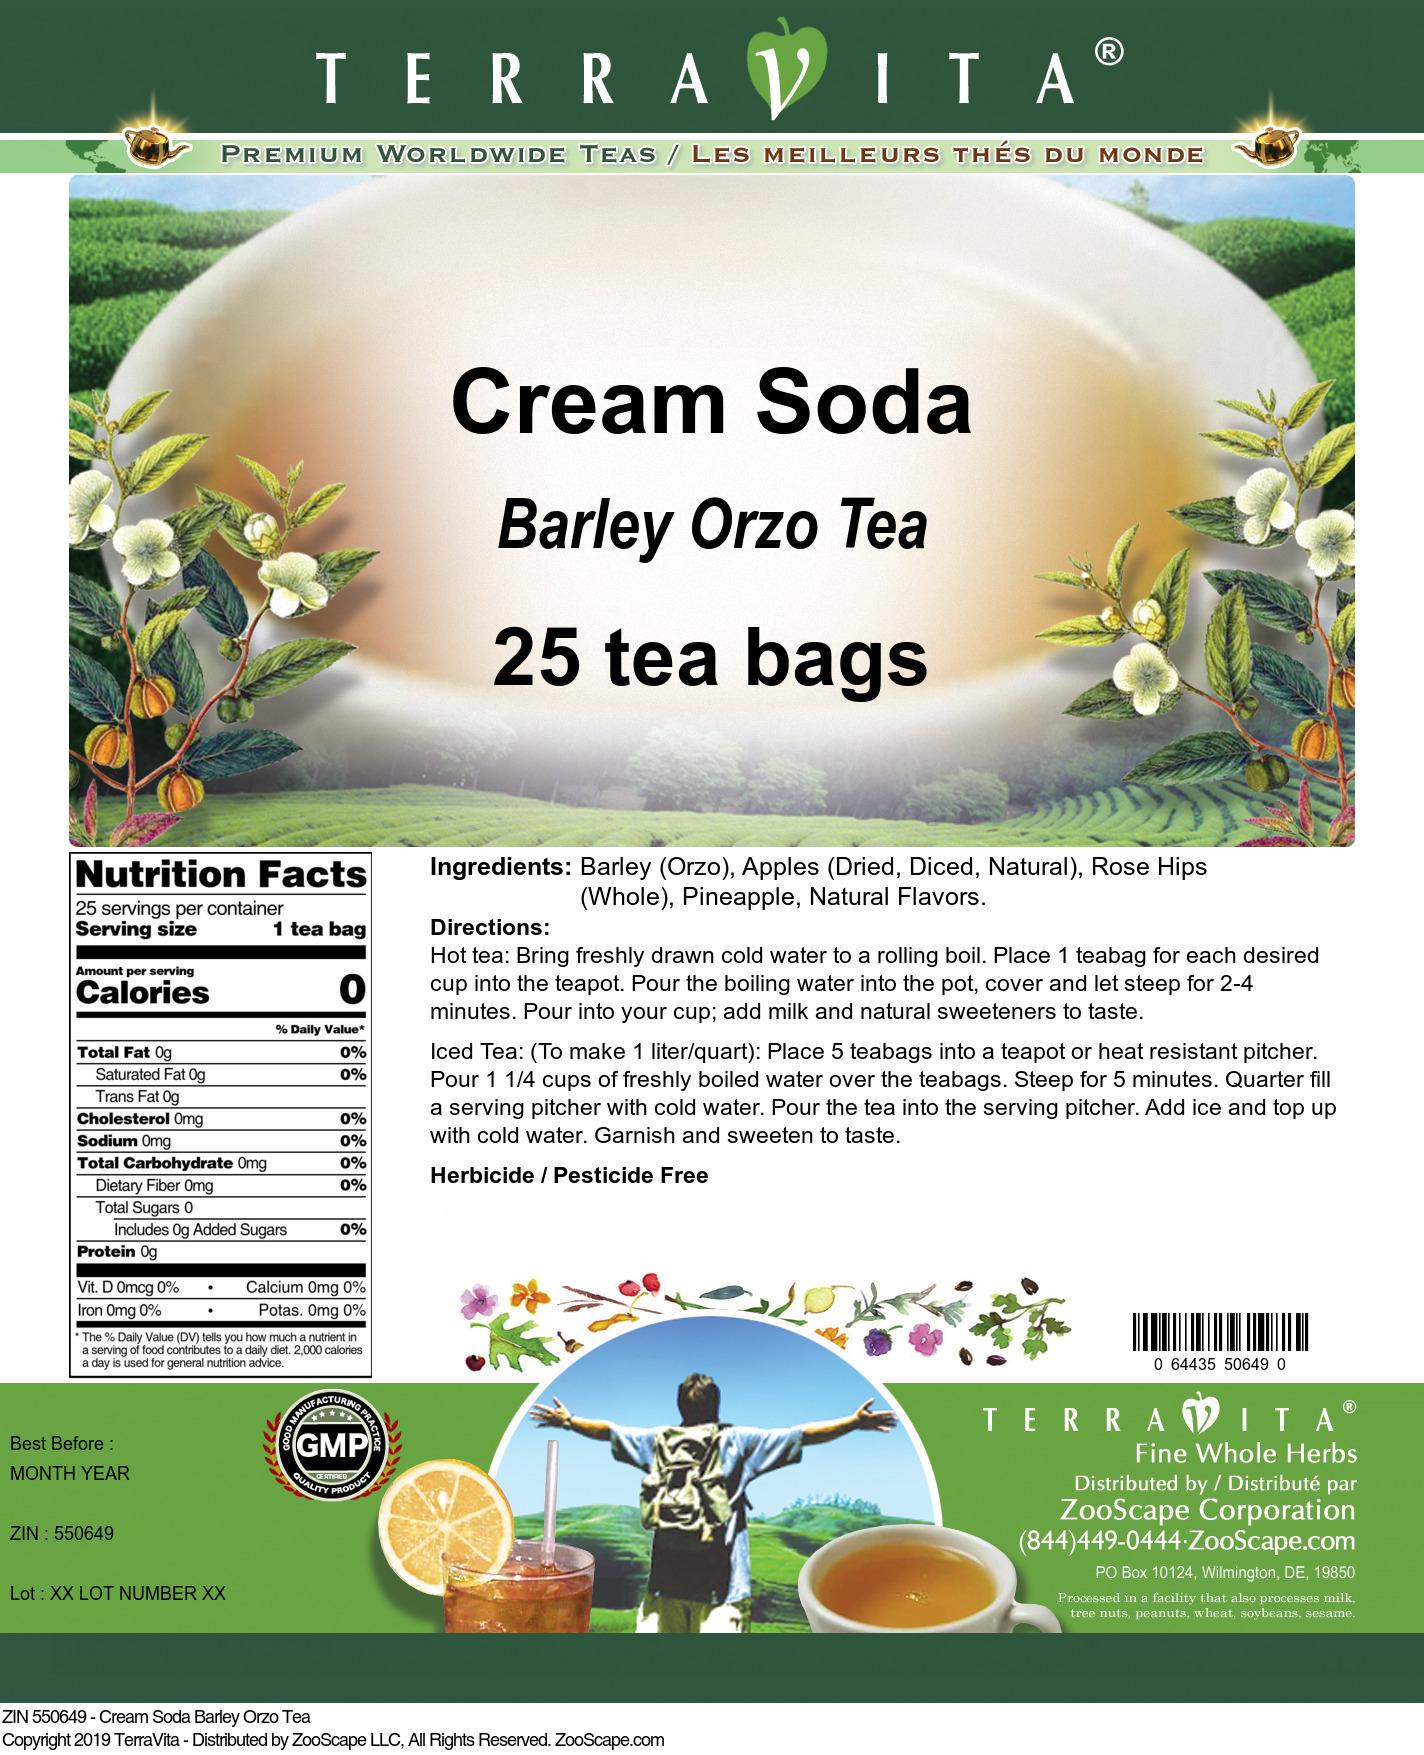 Cream Soda Barley Orzo